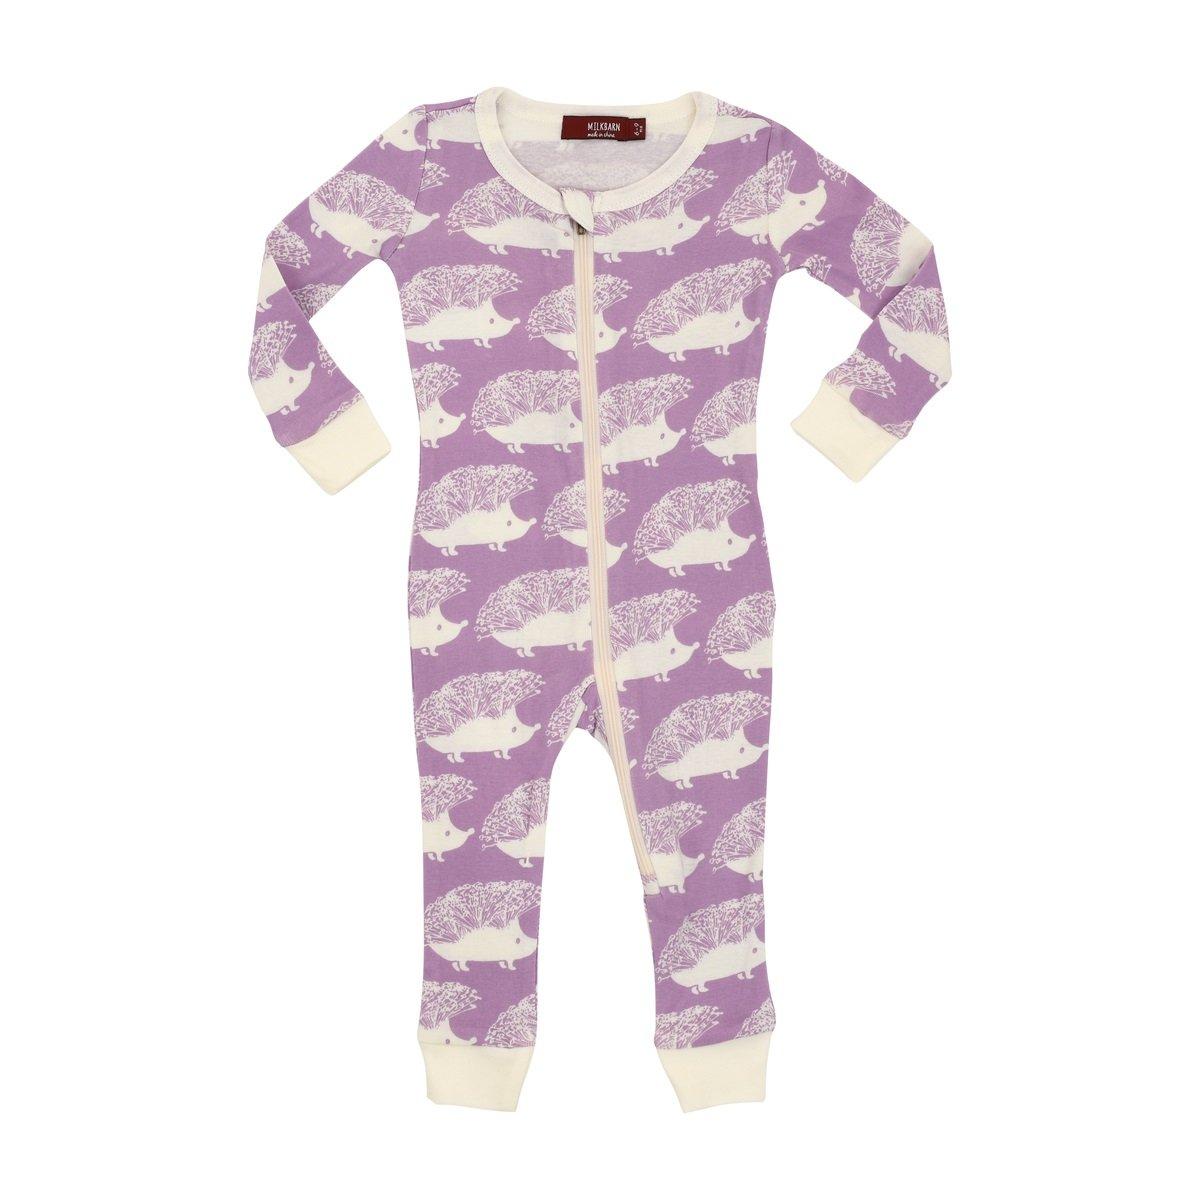 MilkBarn Organic Cotton Zipper Pajama Lavender Hedgehog